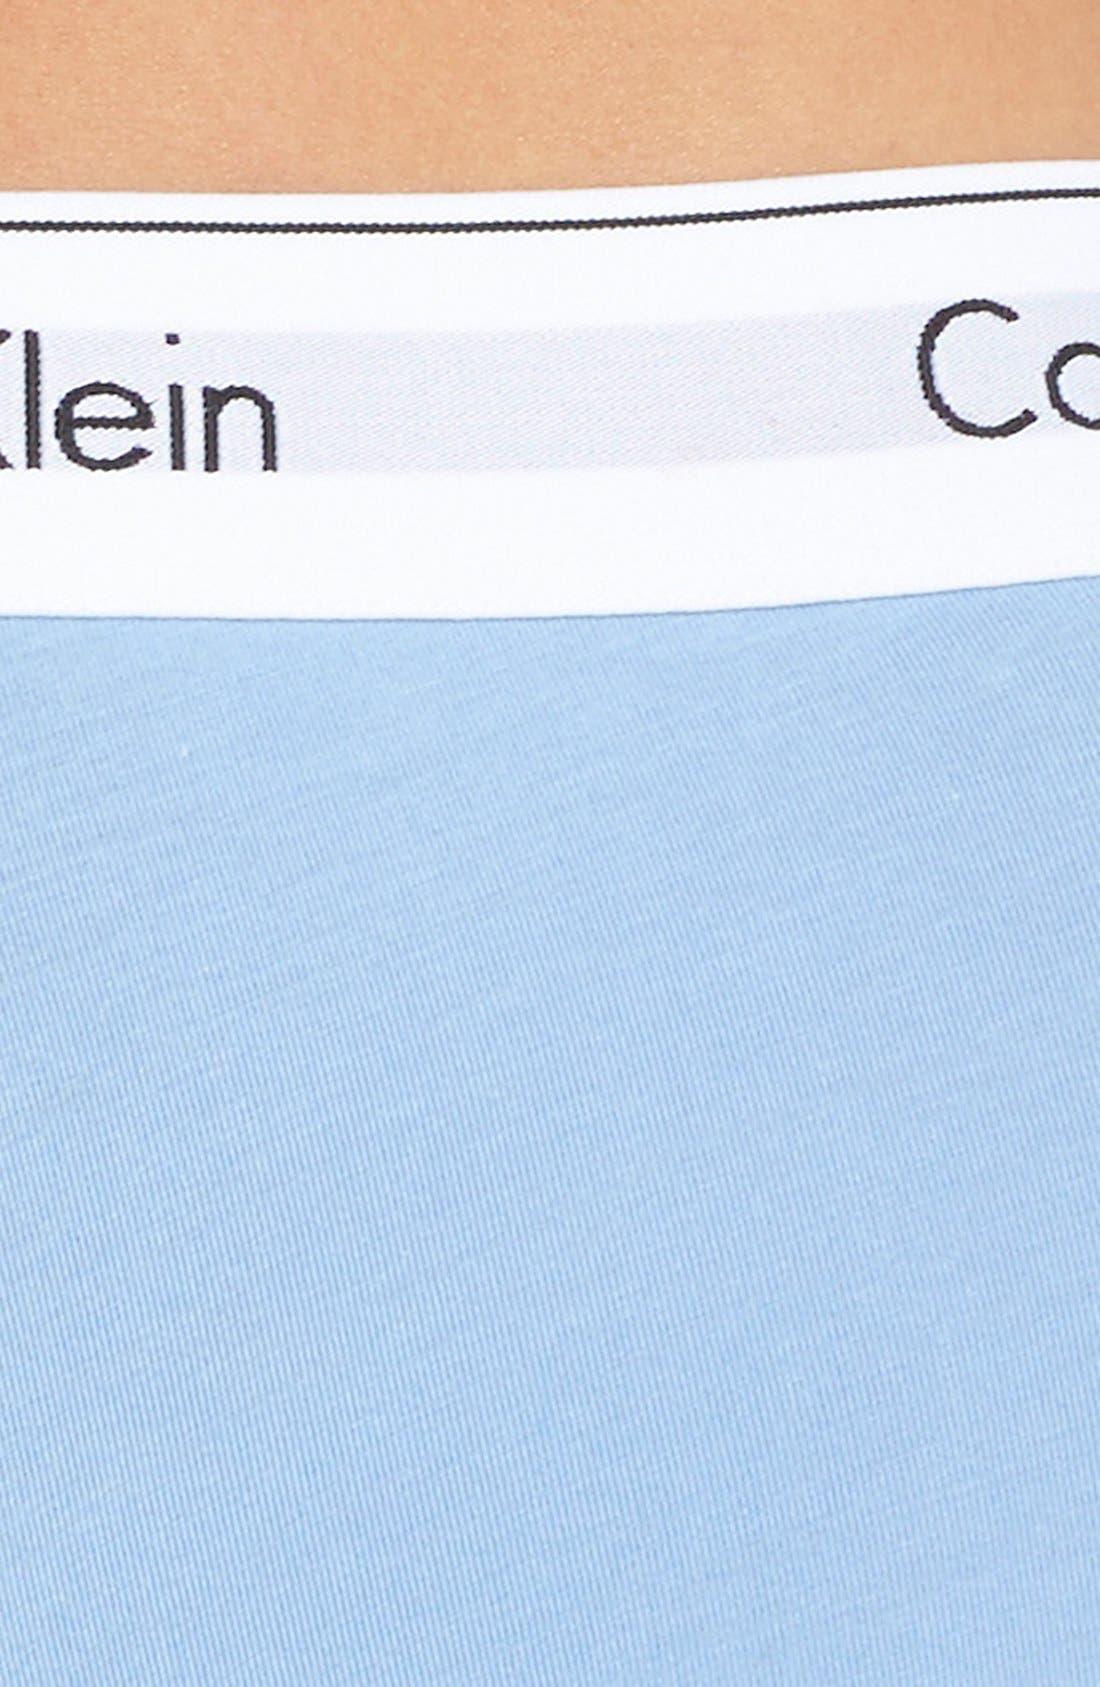 Modern Cotton Collection Boyshorts,                             Alternate thumbnail 92, color,